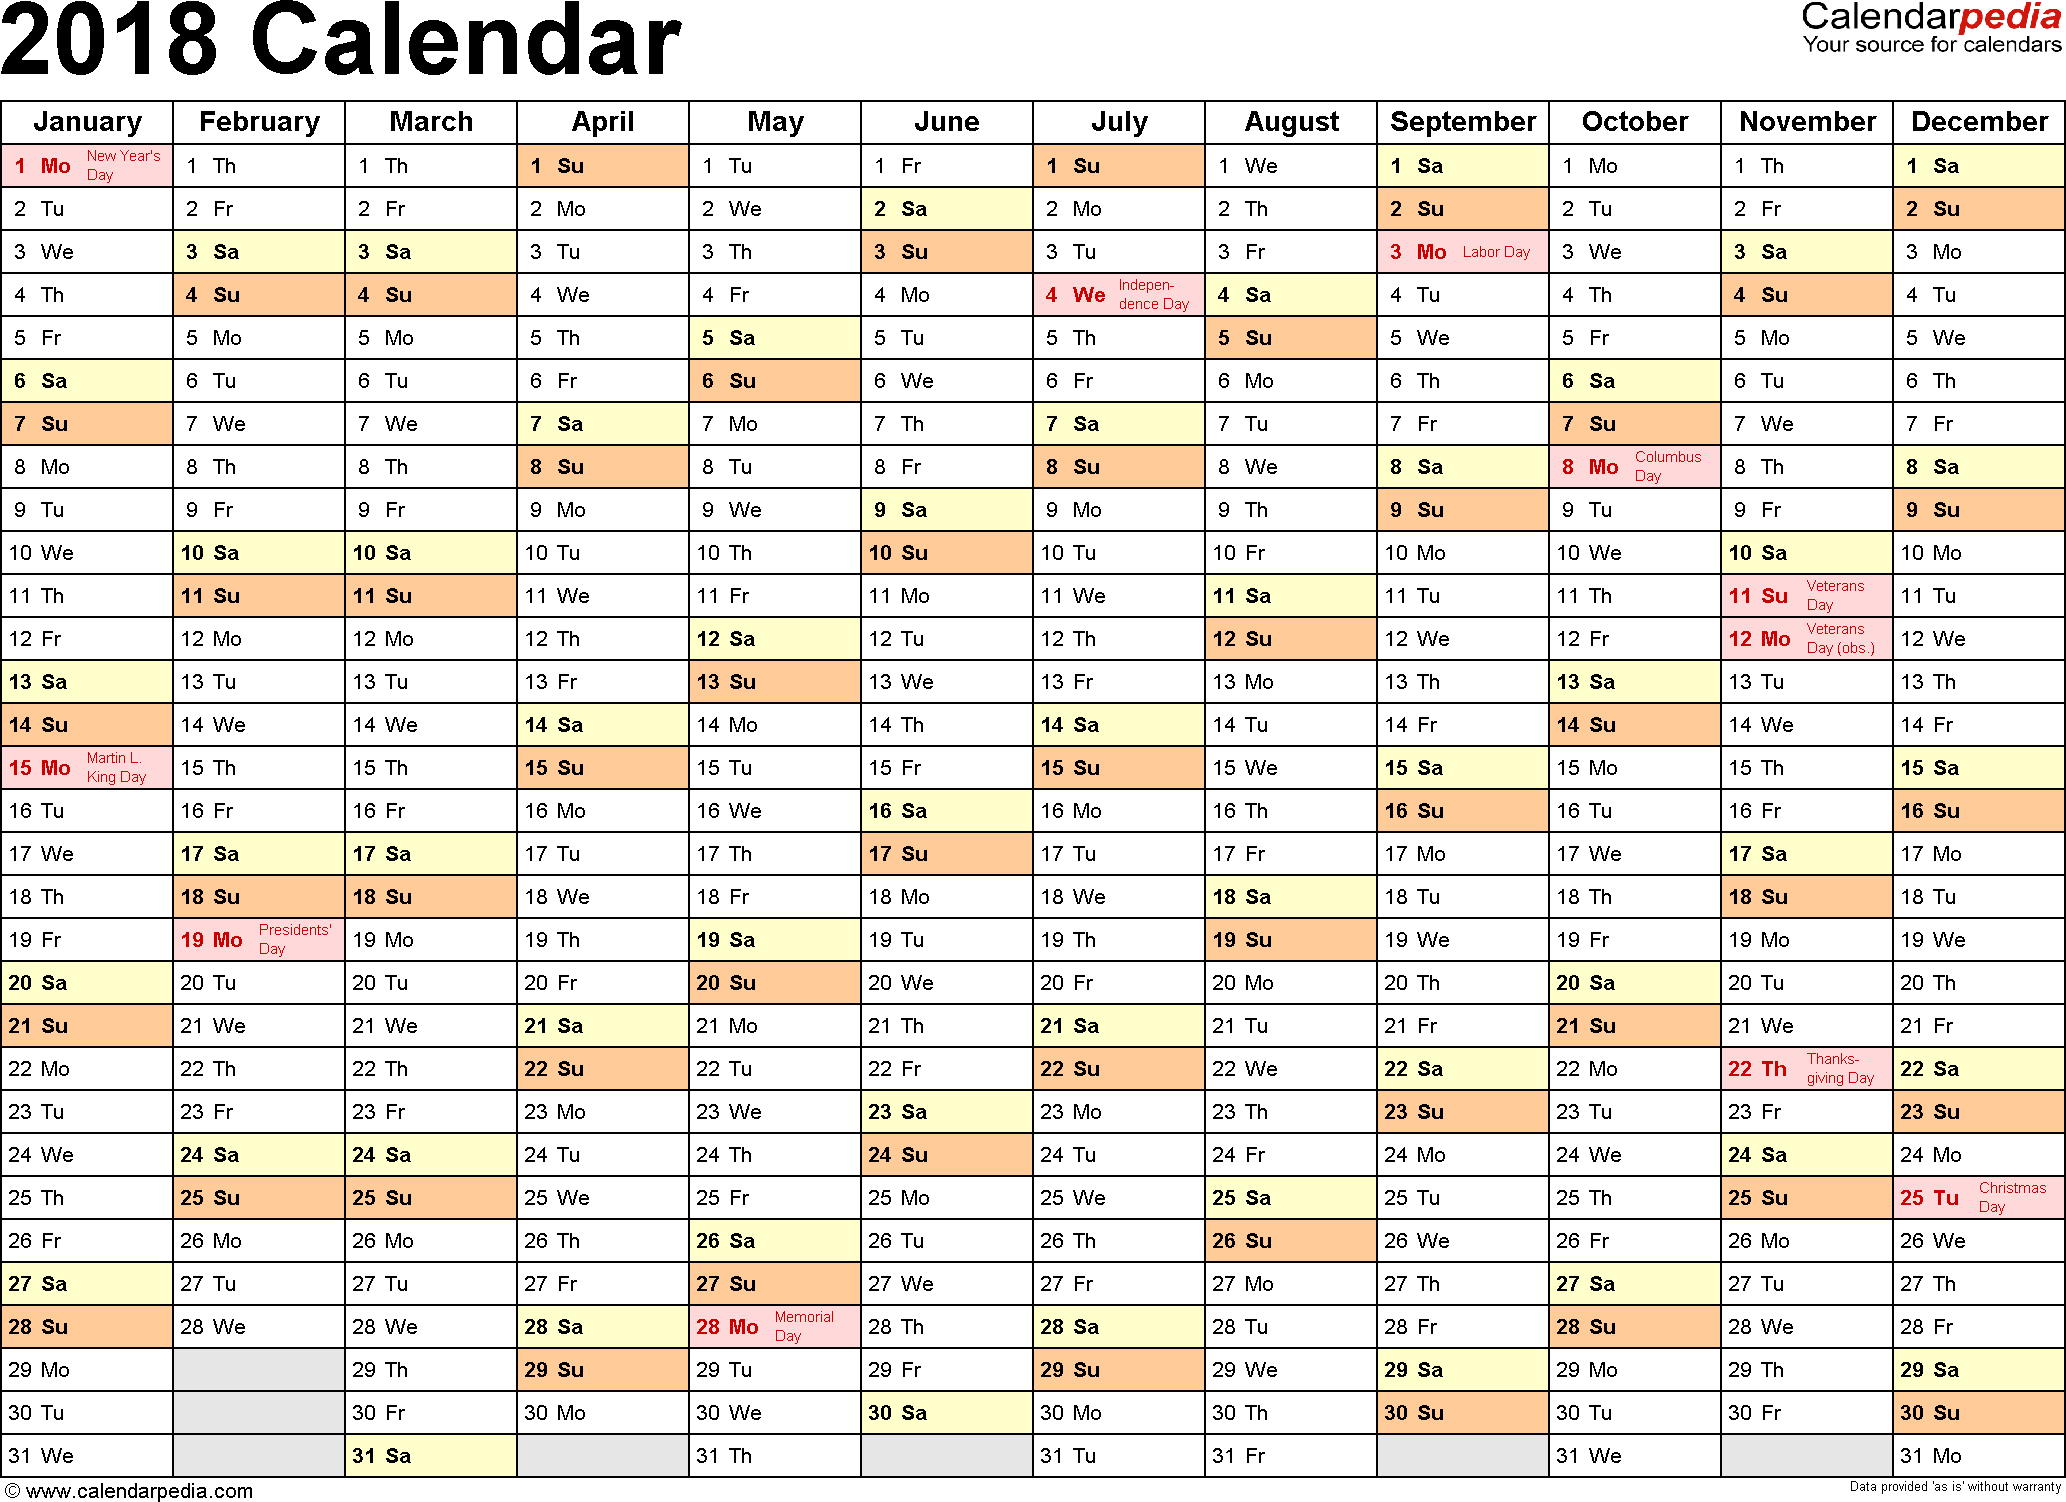 2018 Calendar Download 17 free printable Excel templates (.xlsx)